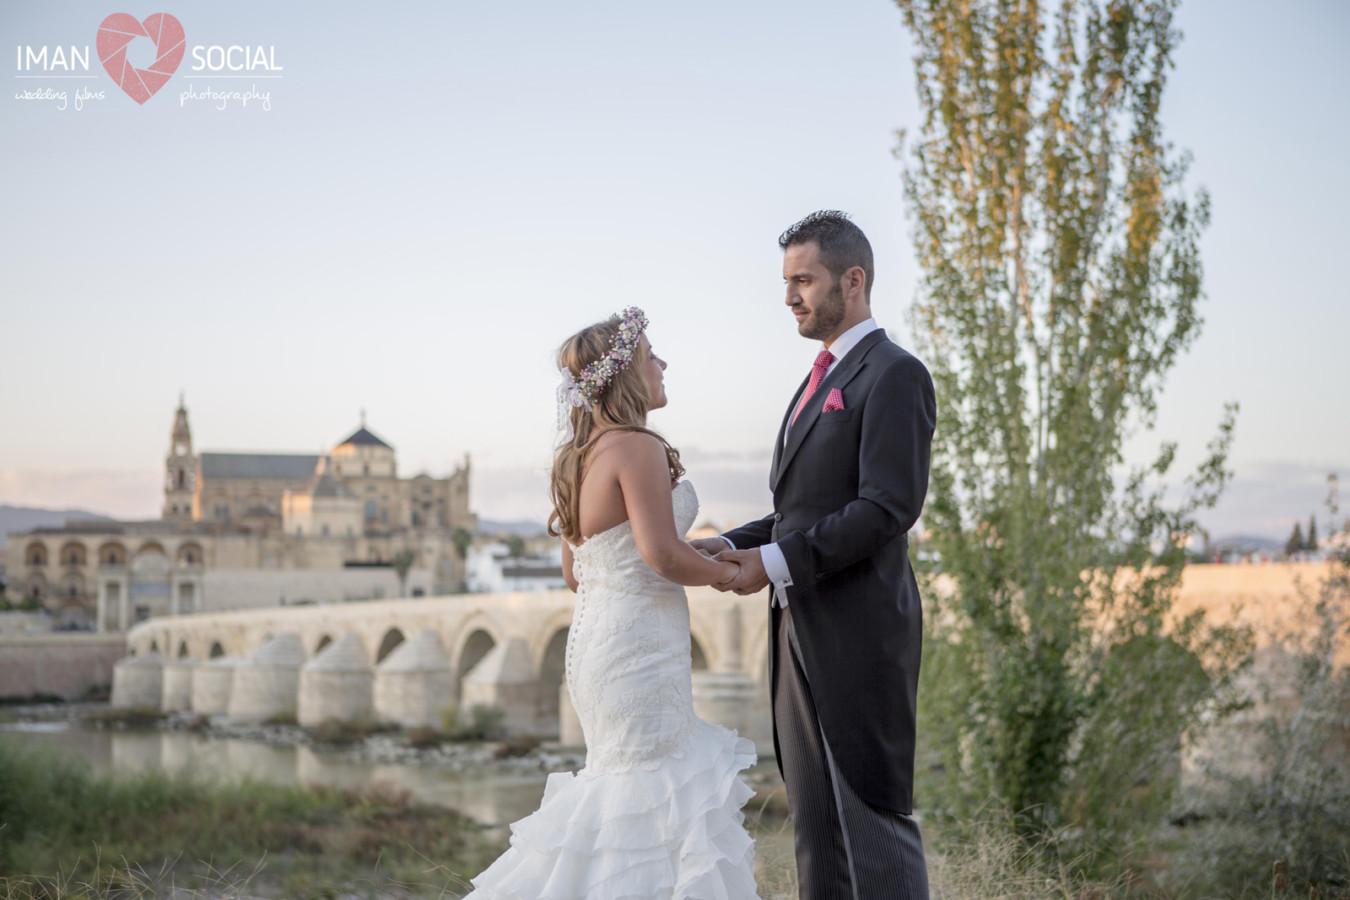 77B0873 Juan Antonio y Mónica - Postboda - video boda cordoba